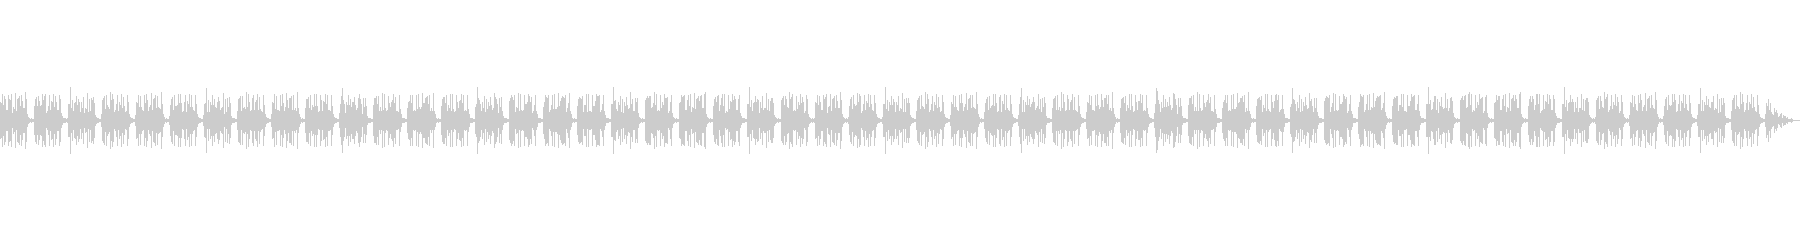 Vtuberの配信 単調なBGMの未再生の波形